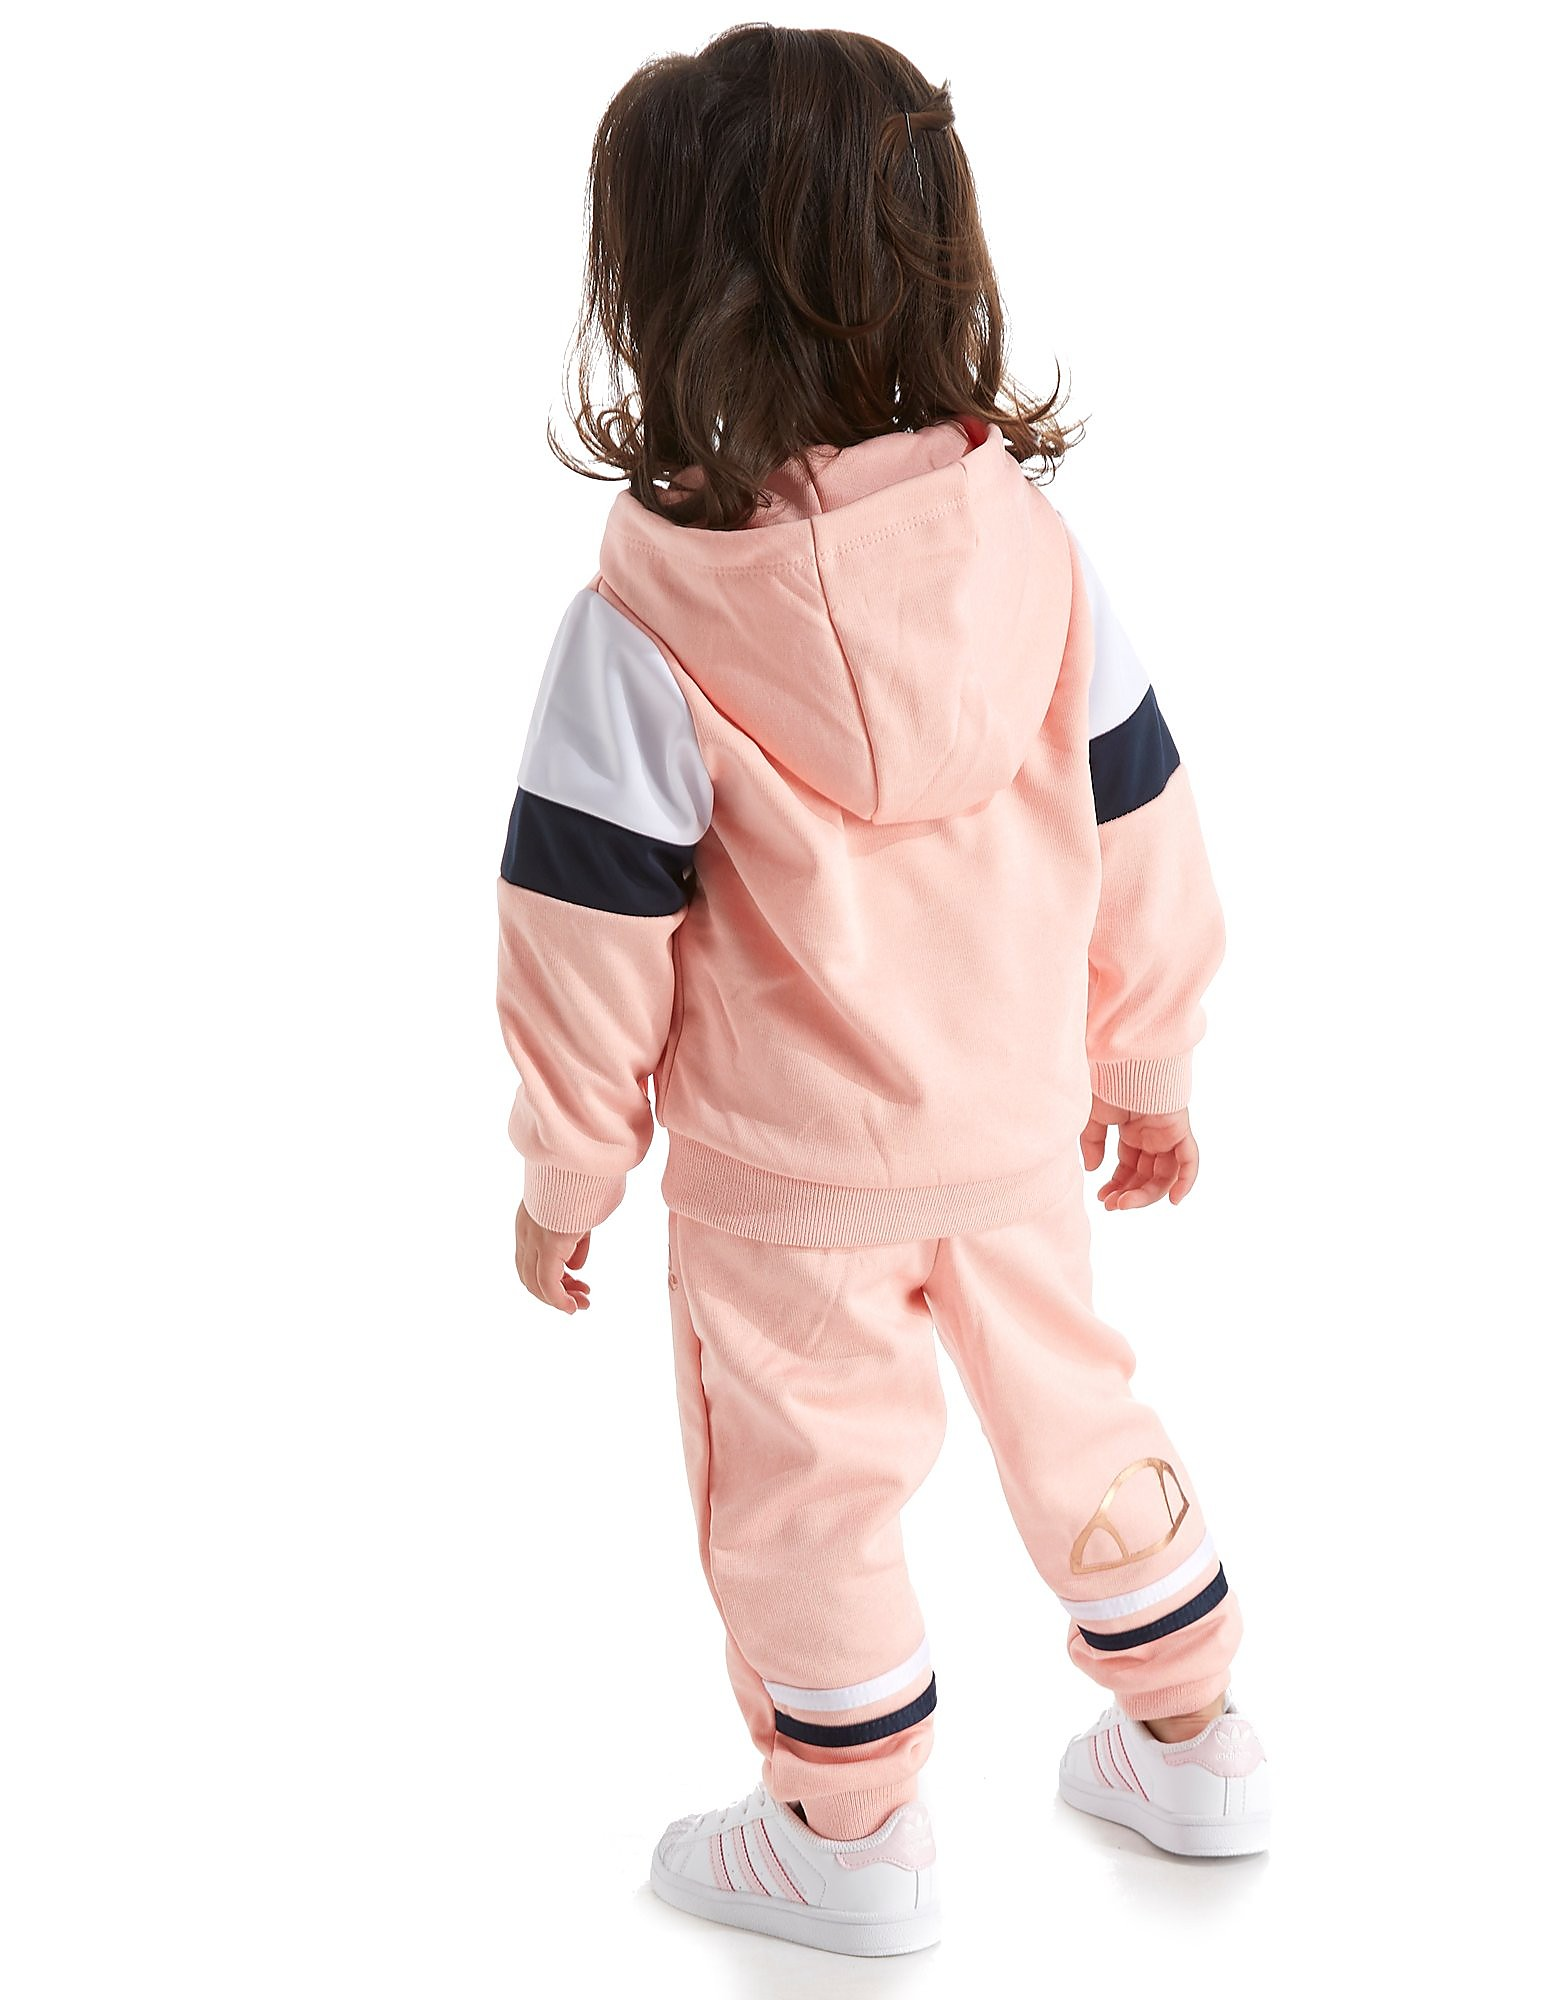 Ellesse Girls' Baccana Full Zip Suit Infant